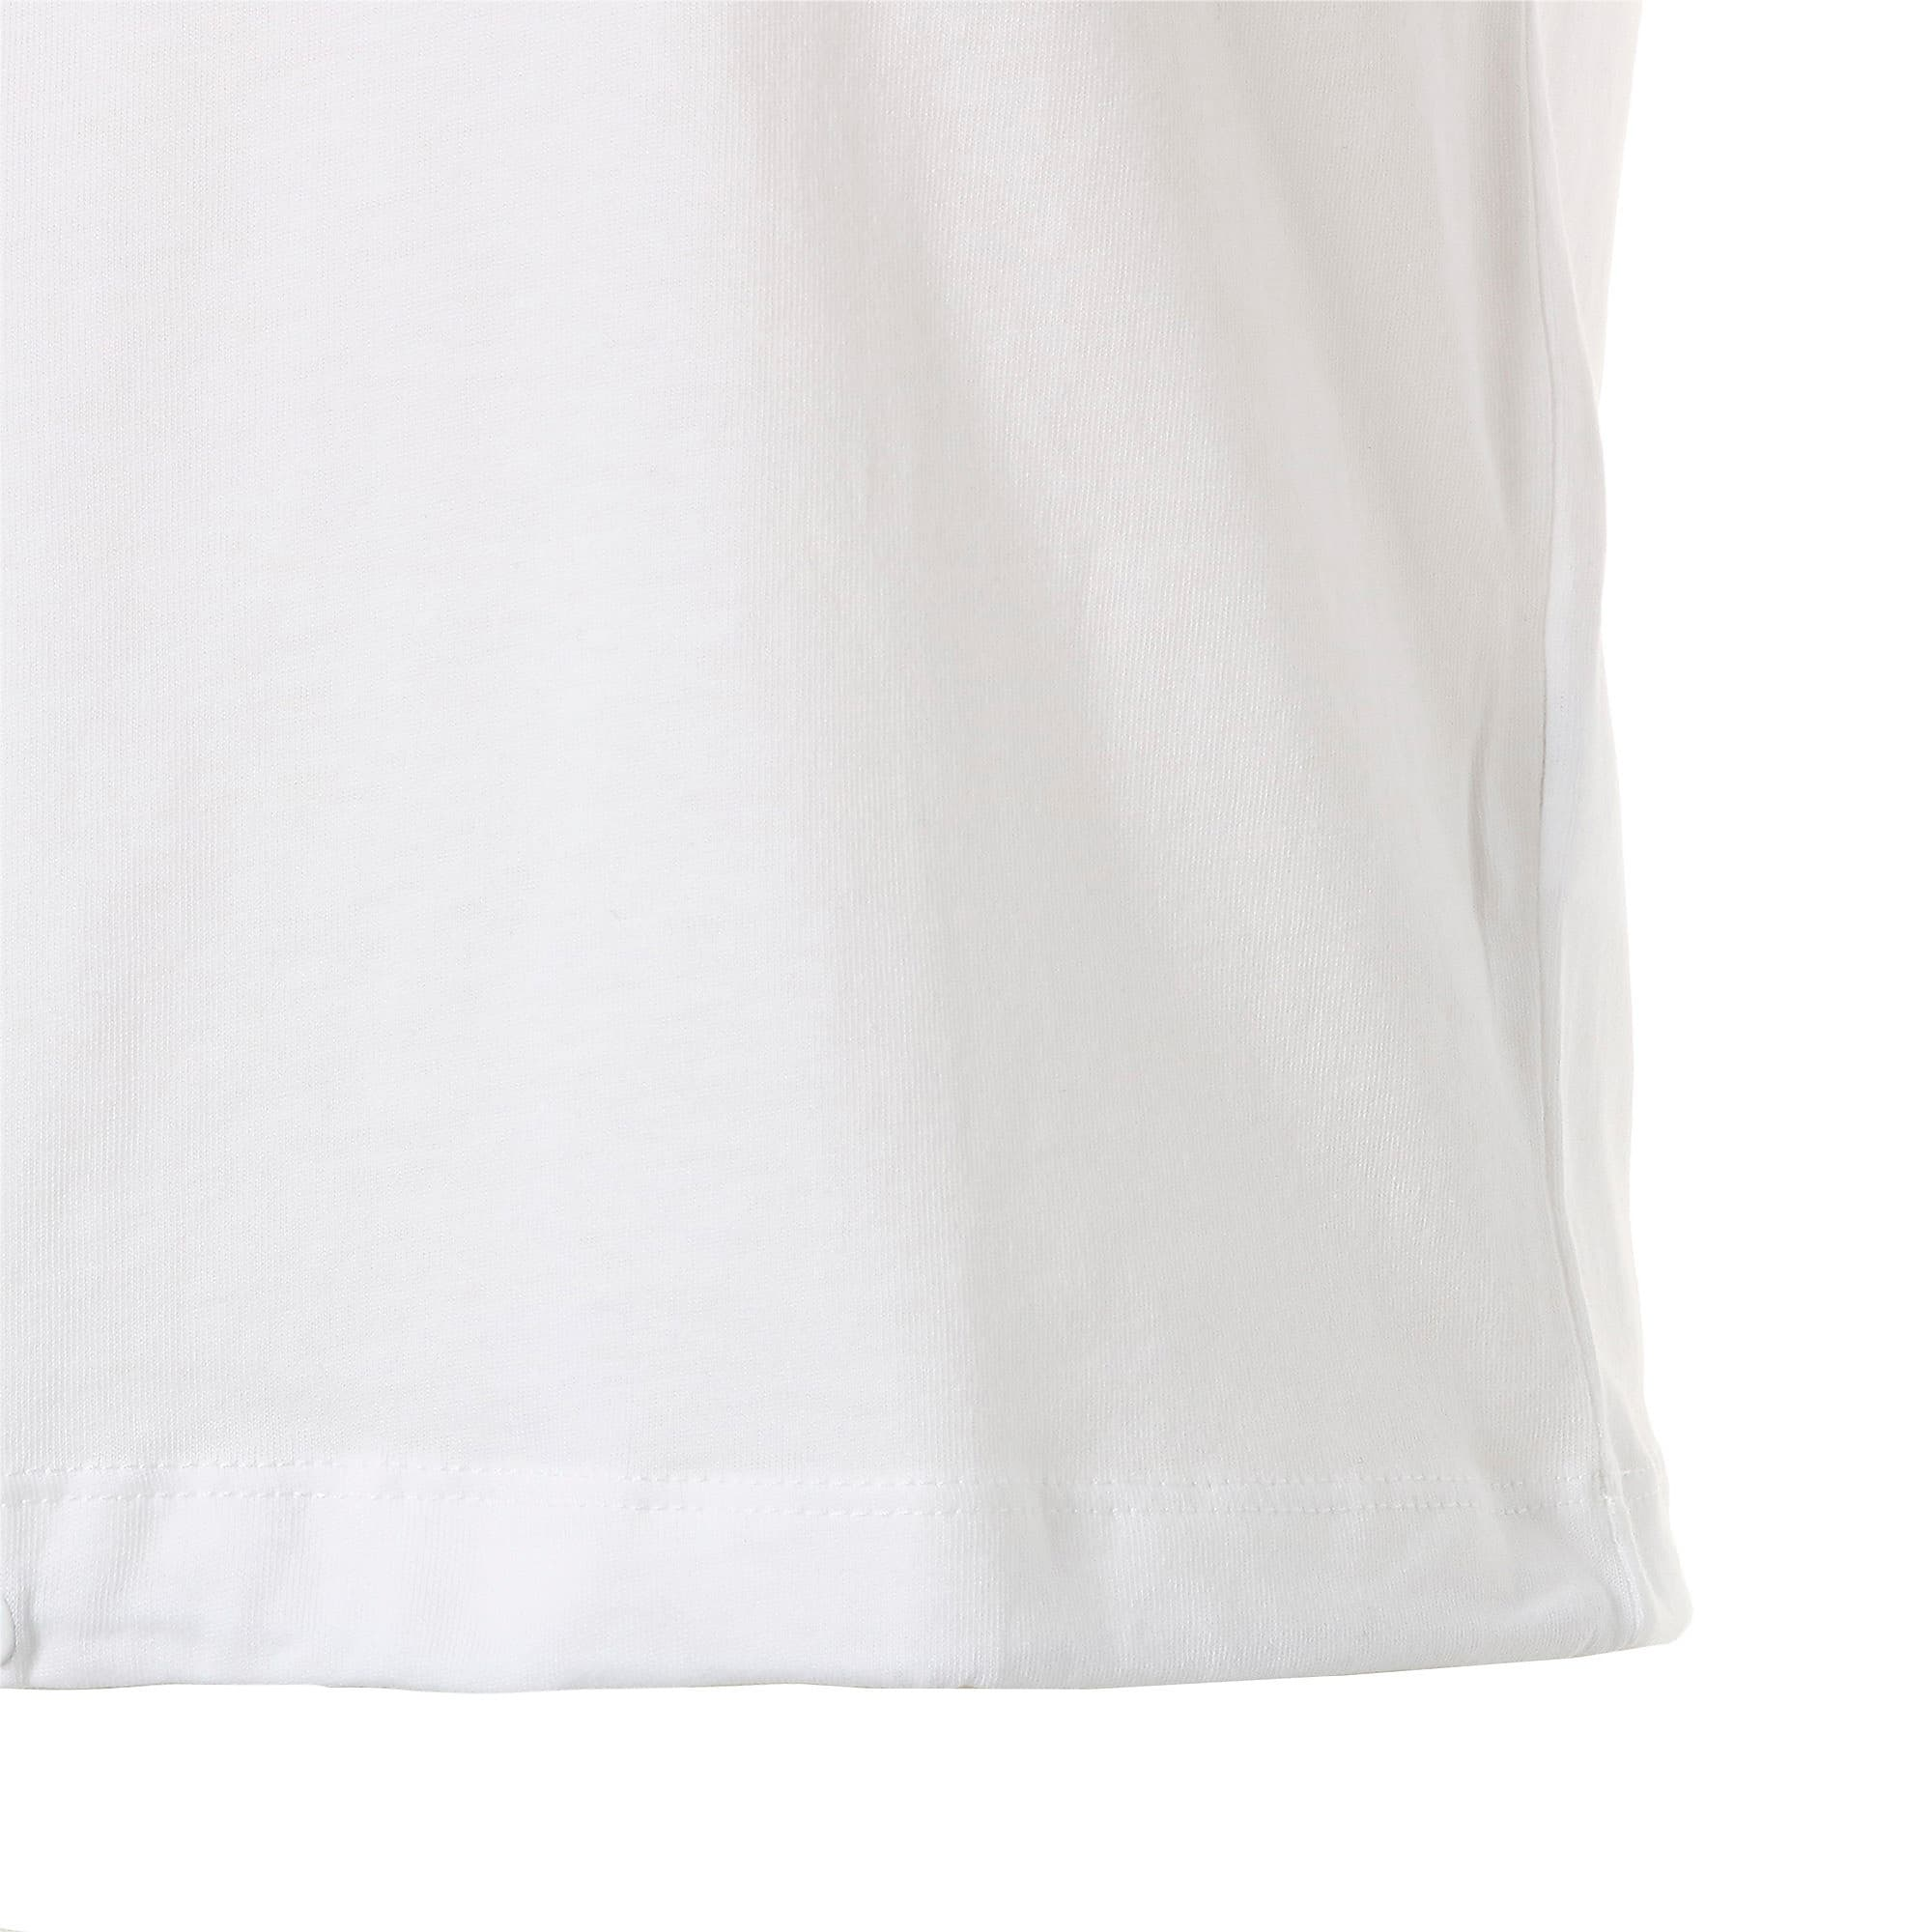 Thumbnail 9 of CHASE V SS ウィメンズ Tシャツ 半袖, Puma White, medium-JPN